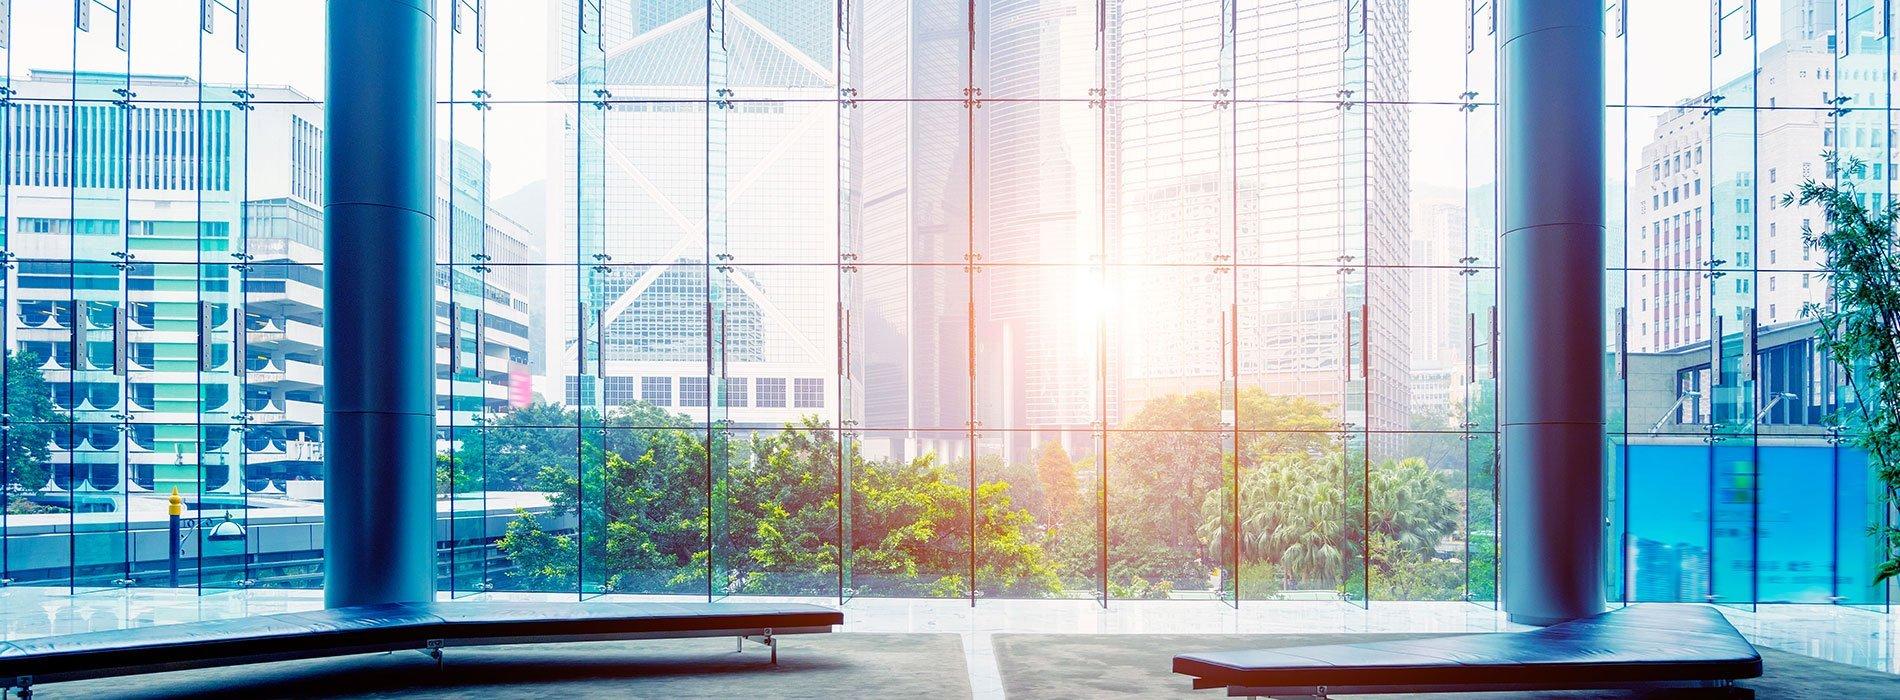 commercial glass design